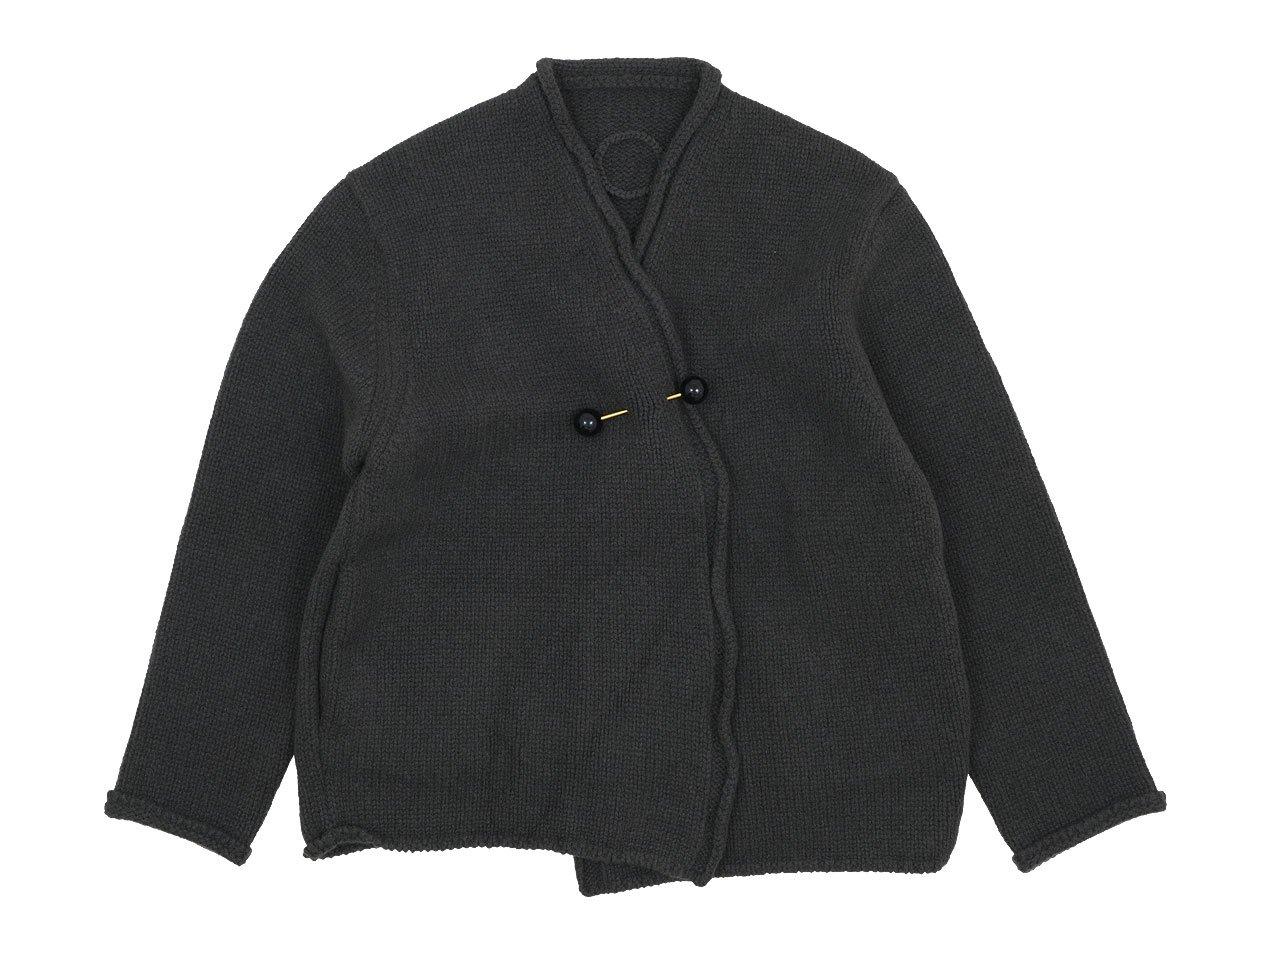 Atelier d'antan Degas(ドガ) Wool Knit Cardigan OLIVE